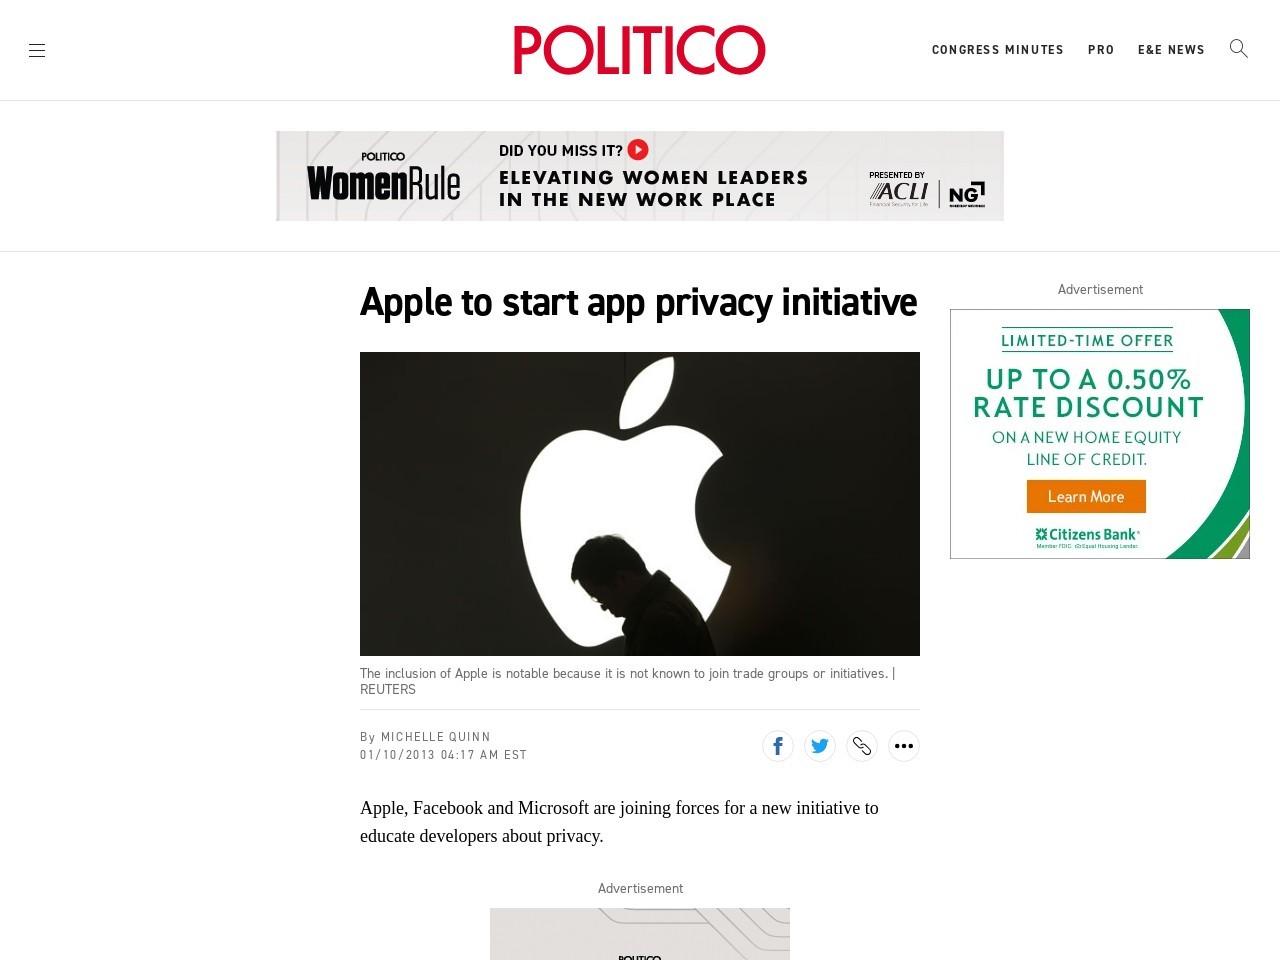 Apple, Facebook, Microsoft to start app privacy initiative